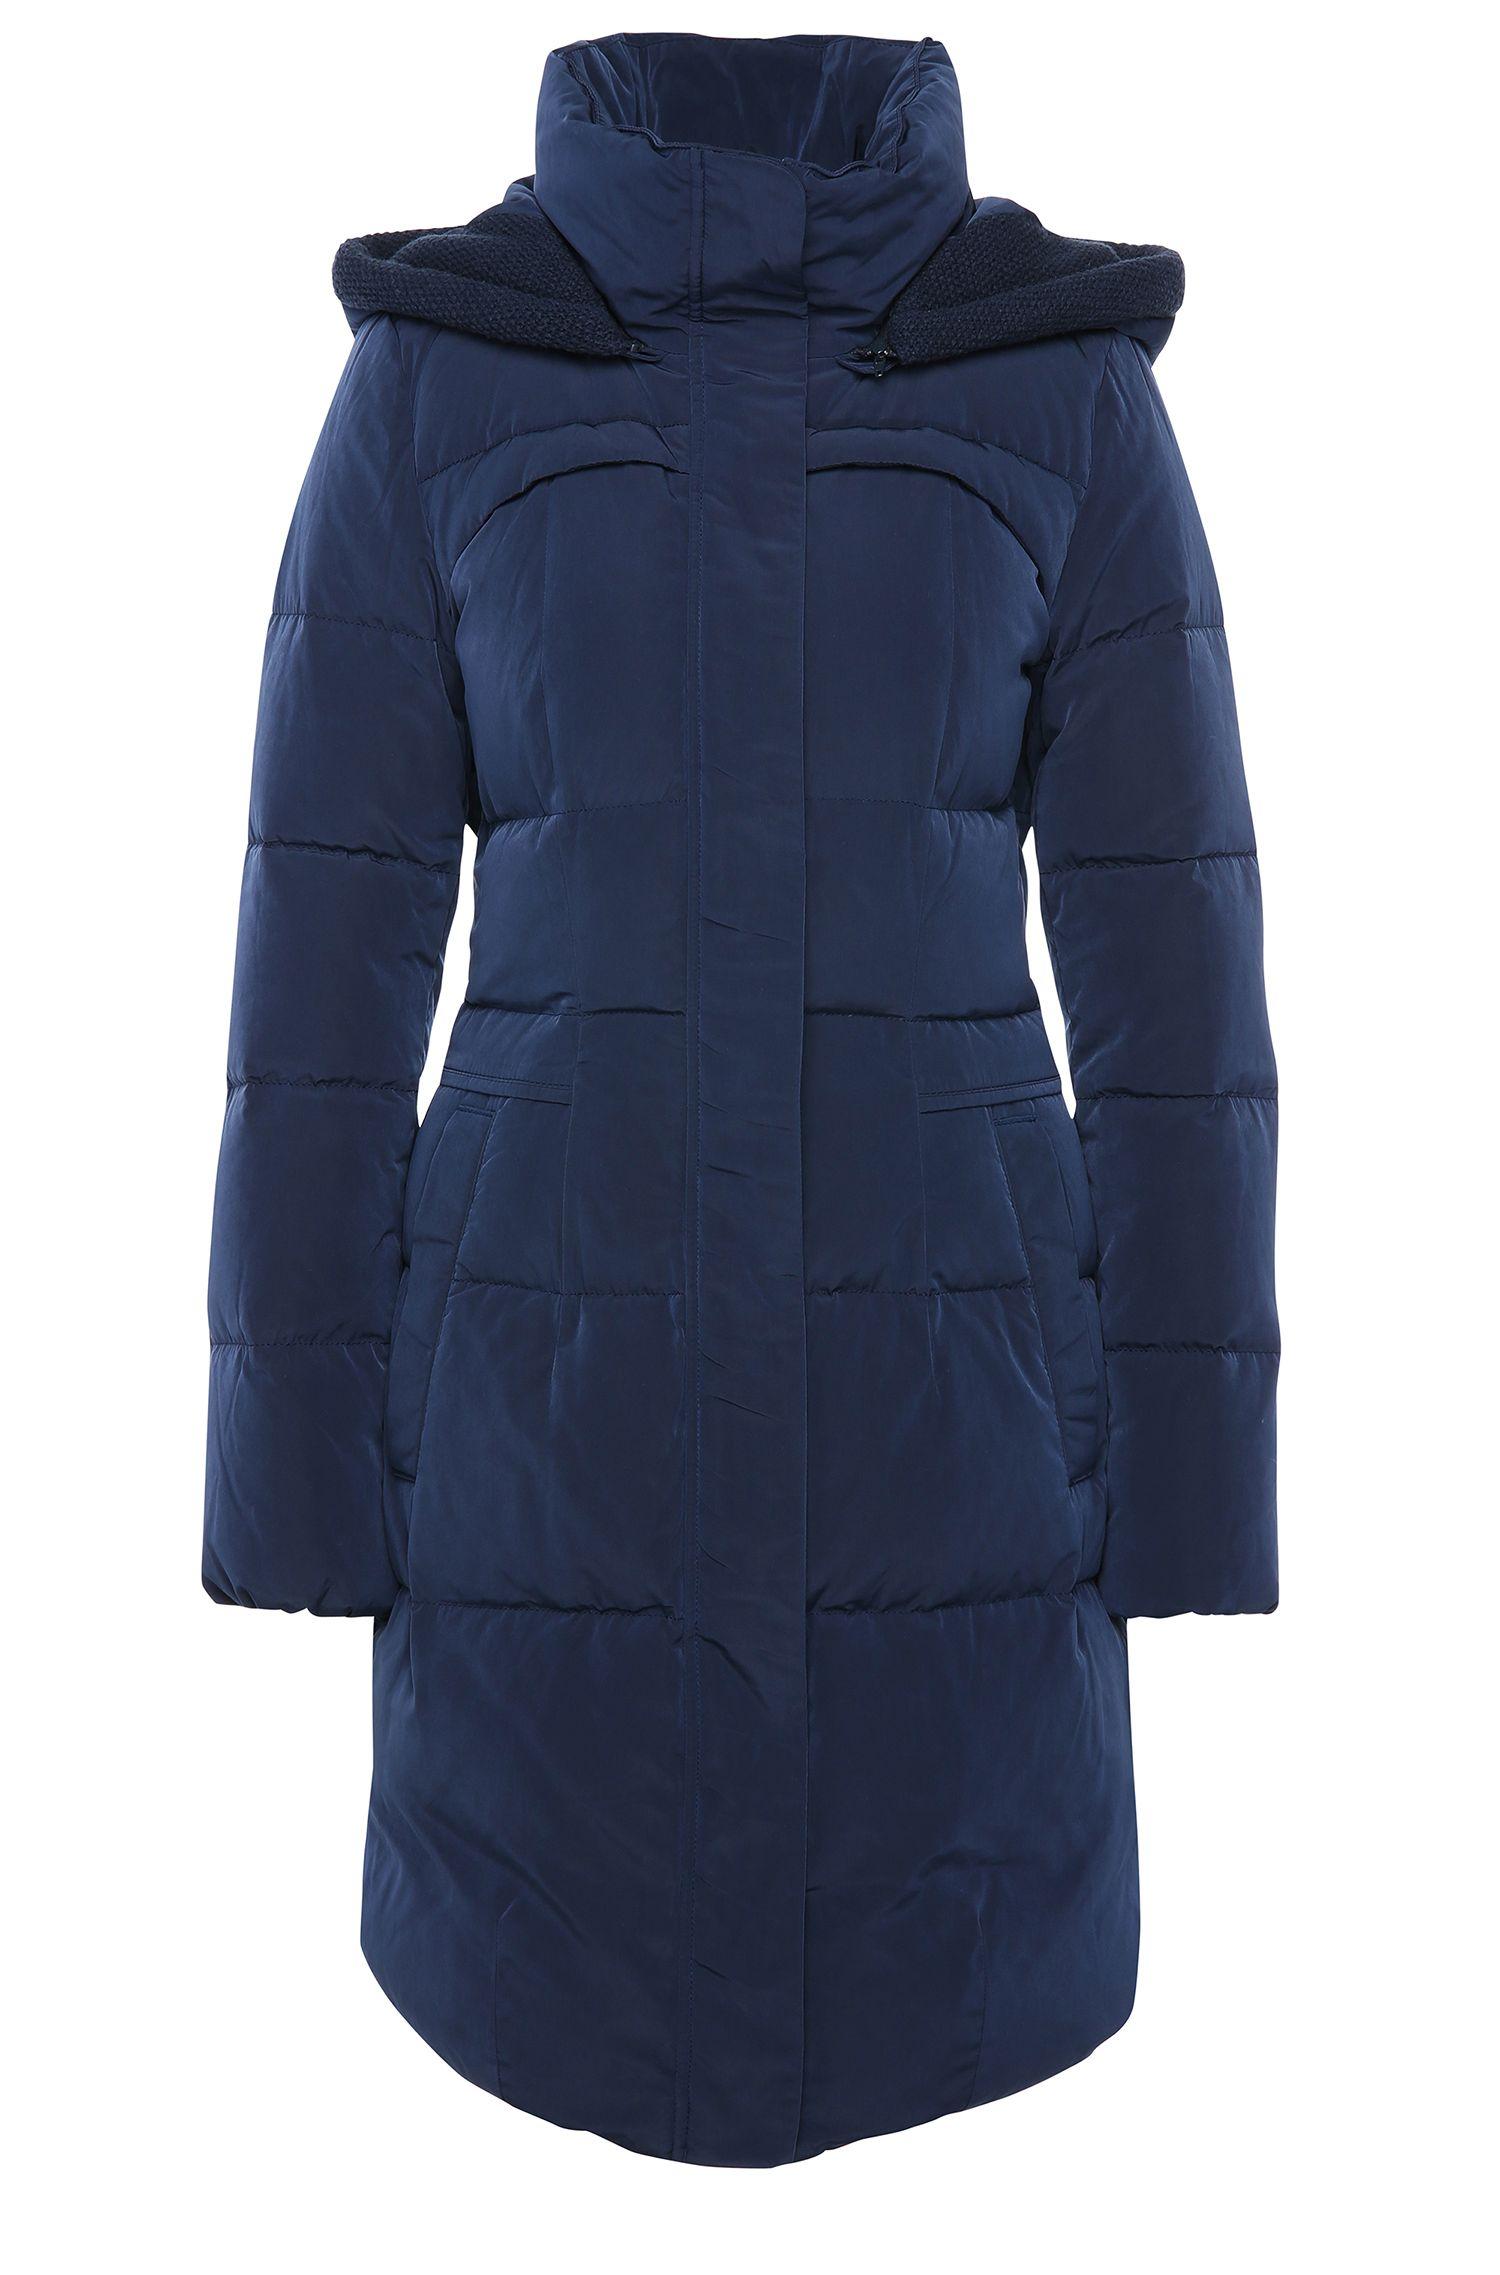 Abrigo guateado con capucha extraíble y corte entallado: 'Osenna'